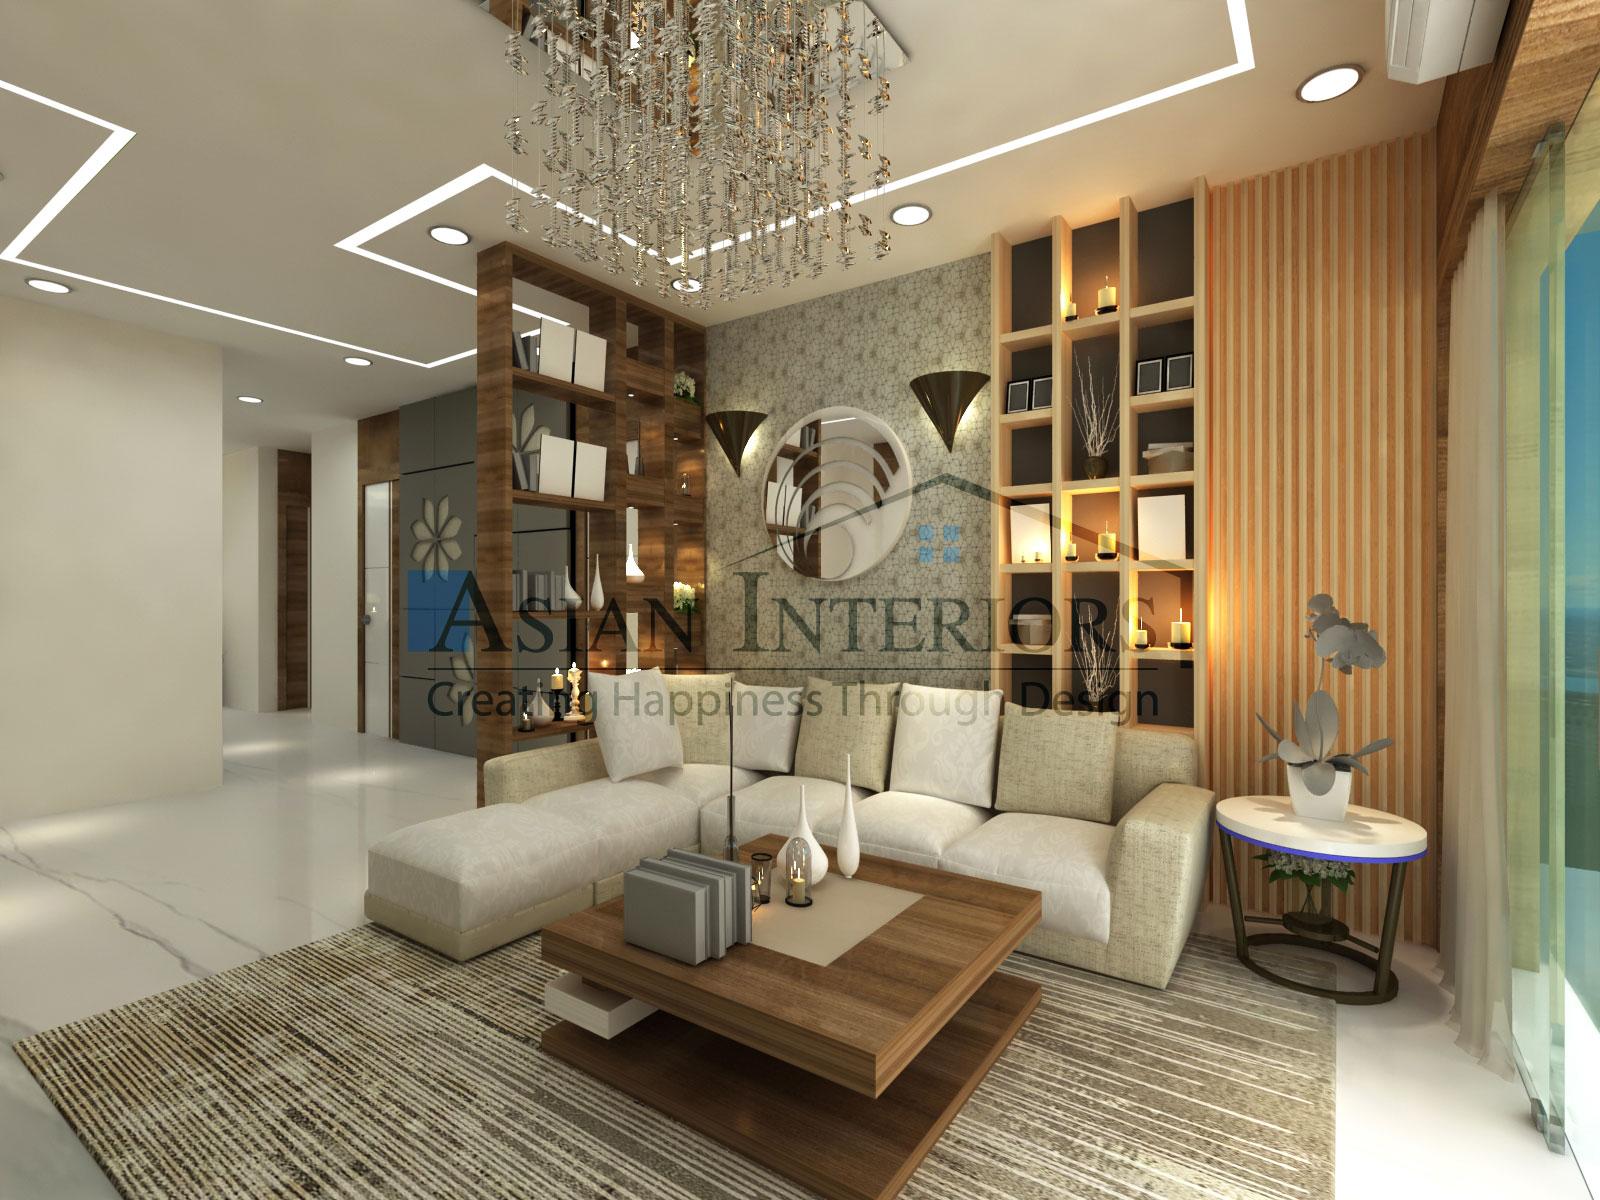 Asian-Interiors-DrawingRoom11